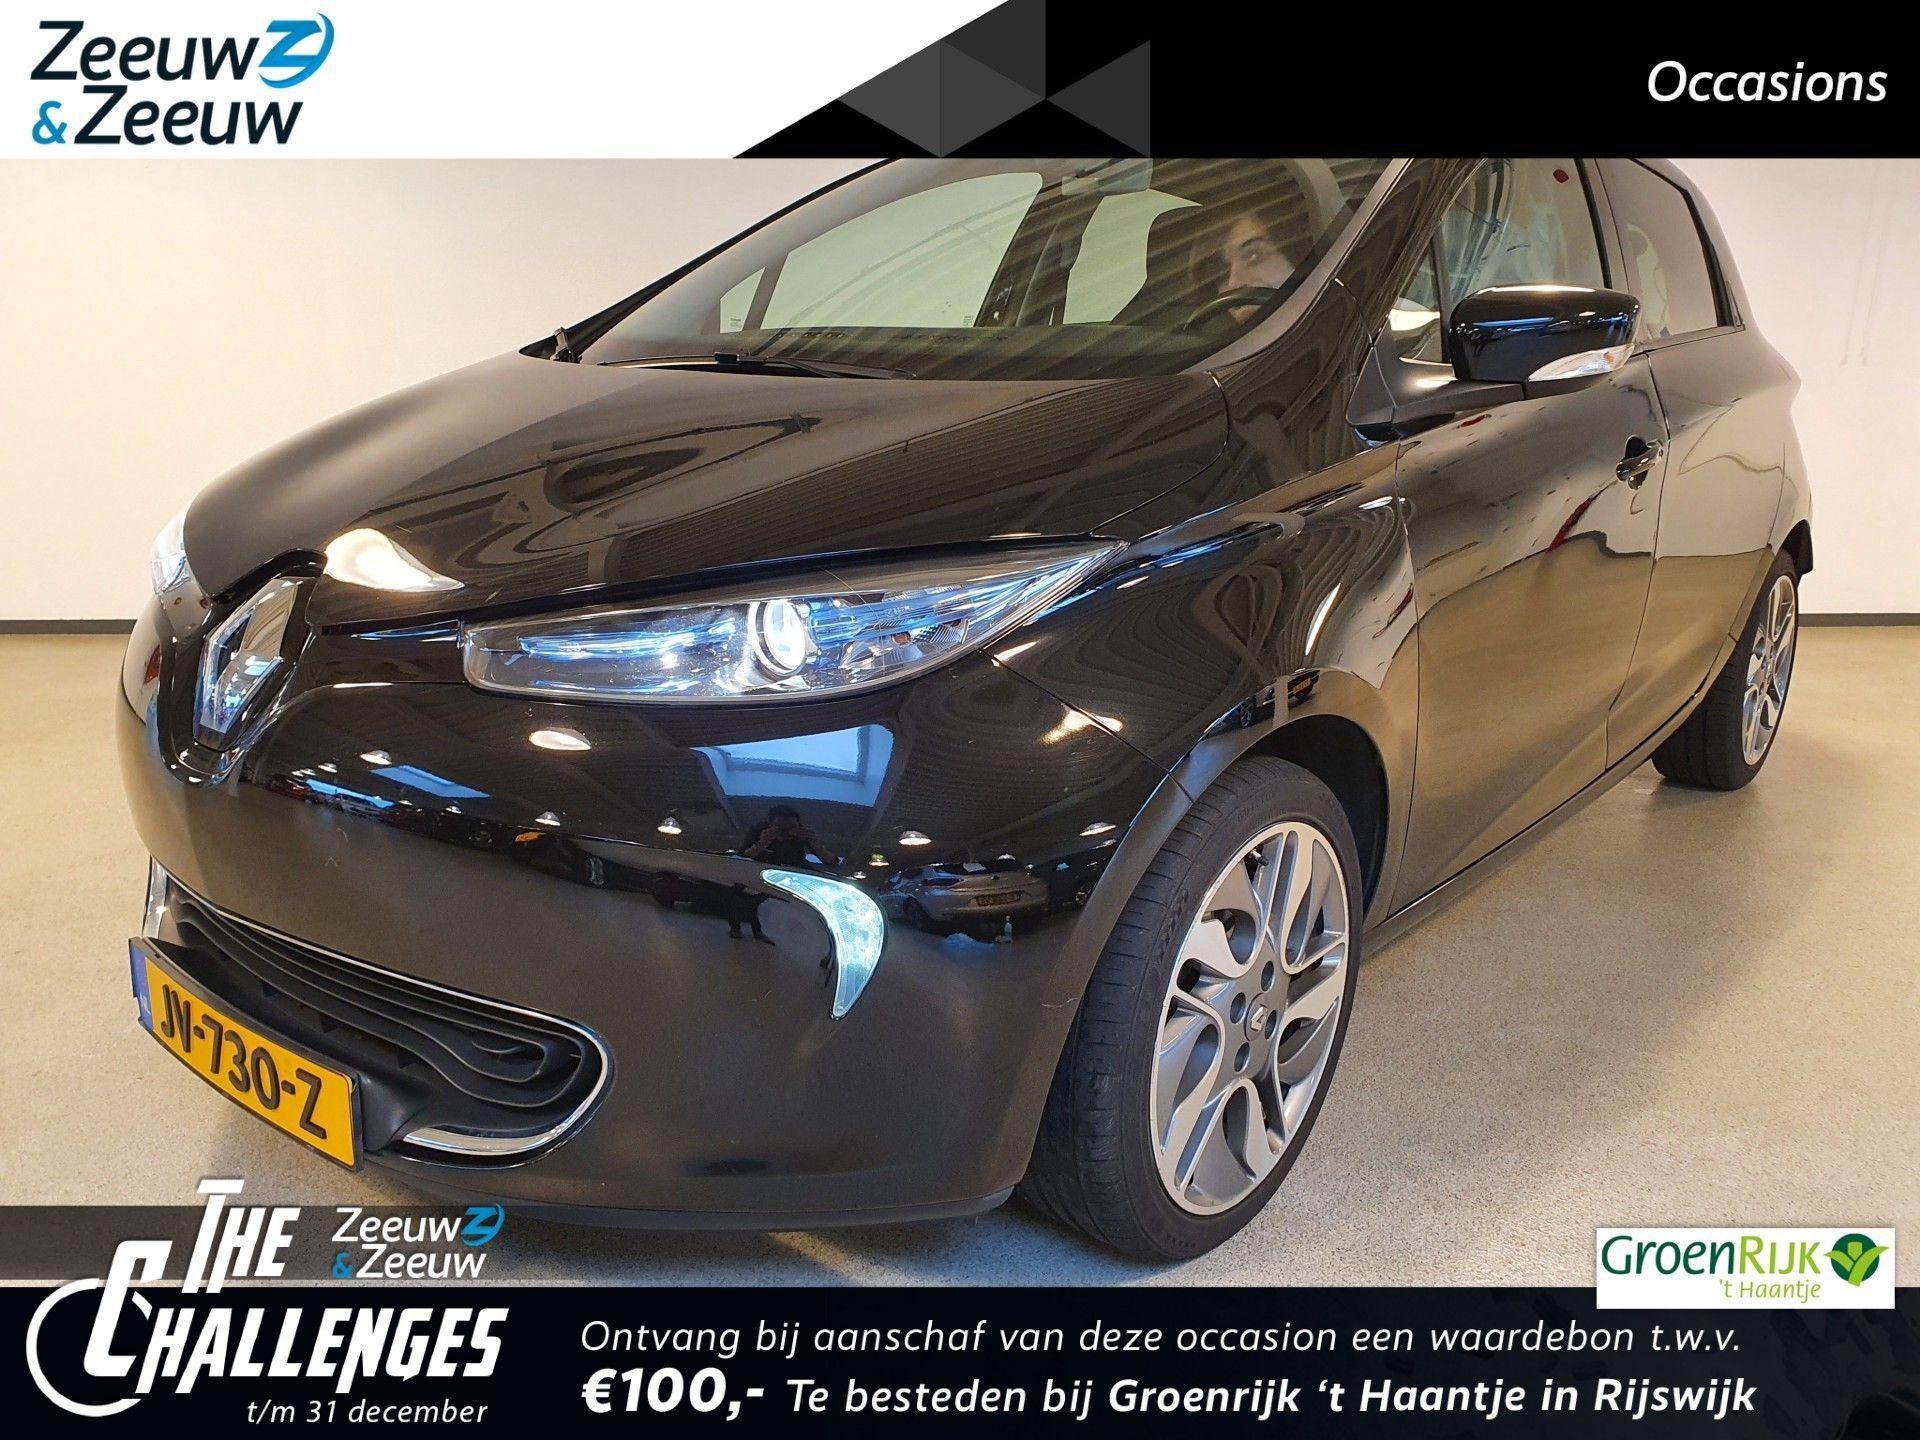 Renault Zoe Q210 Intens Quickcharge 22 kWh (ex Accu) NAVI CLIMATE PARKEERSENSOR VELGEN TEL